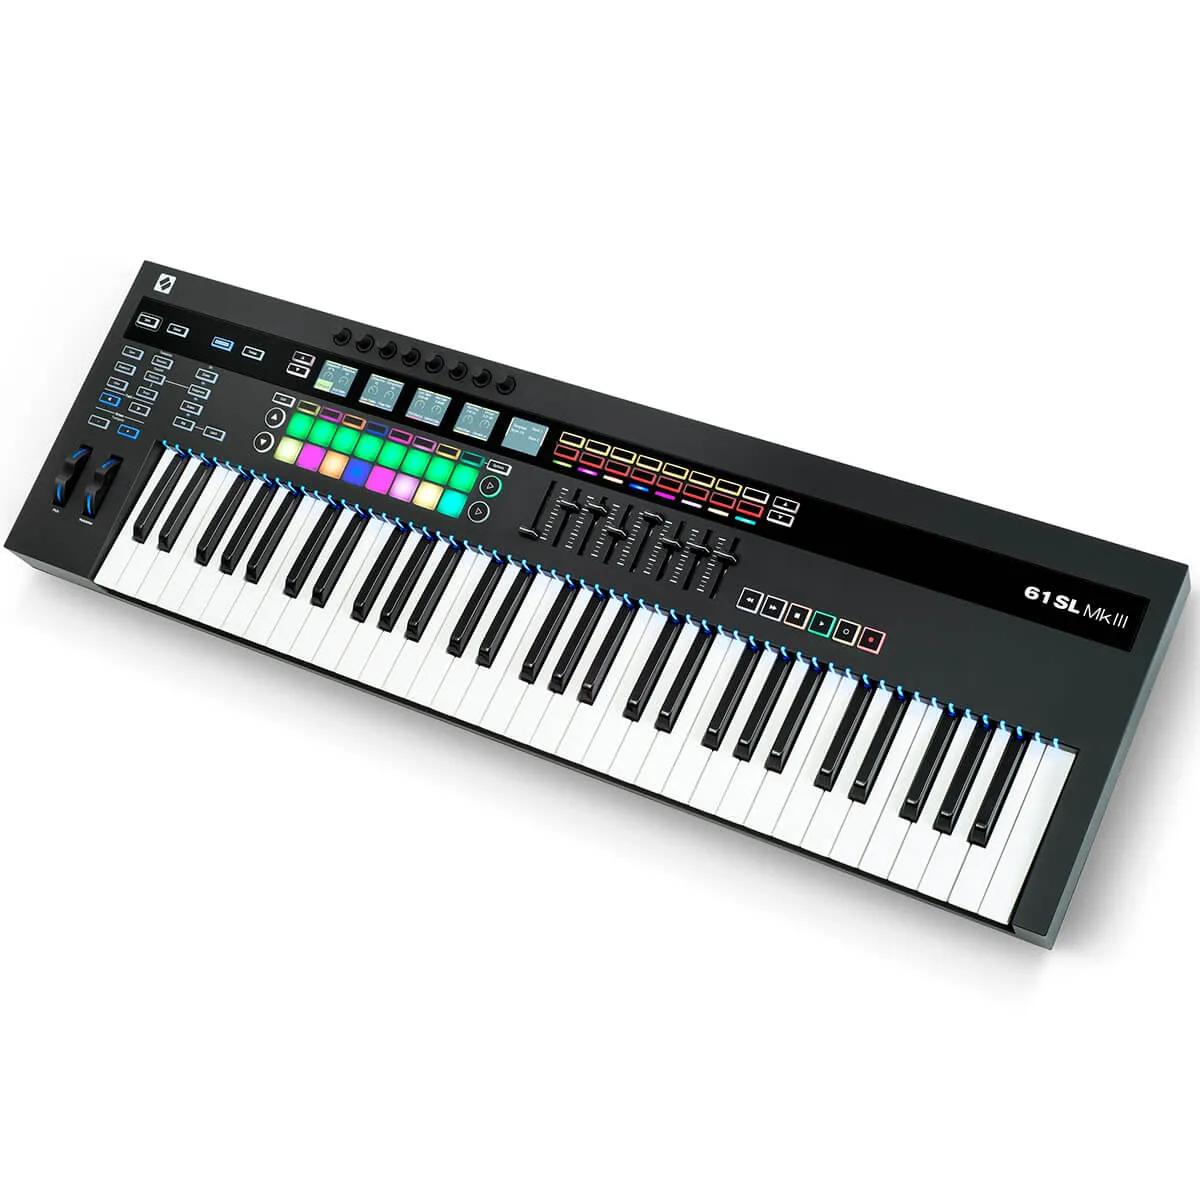 Teclado Controlador Novation SL MK3-61 MIDI Usb 61 Teclas